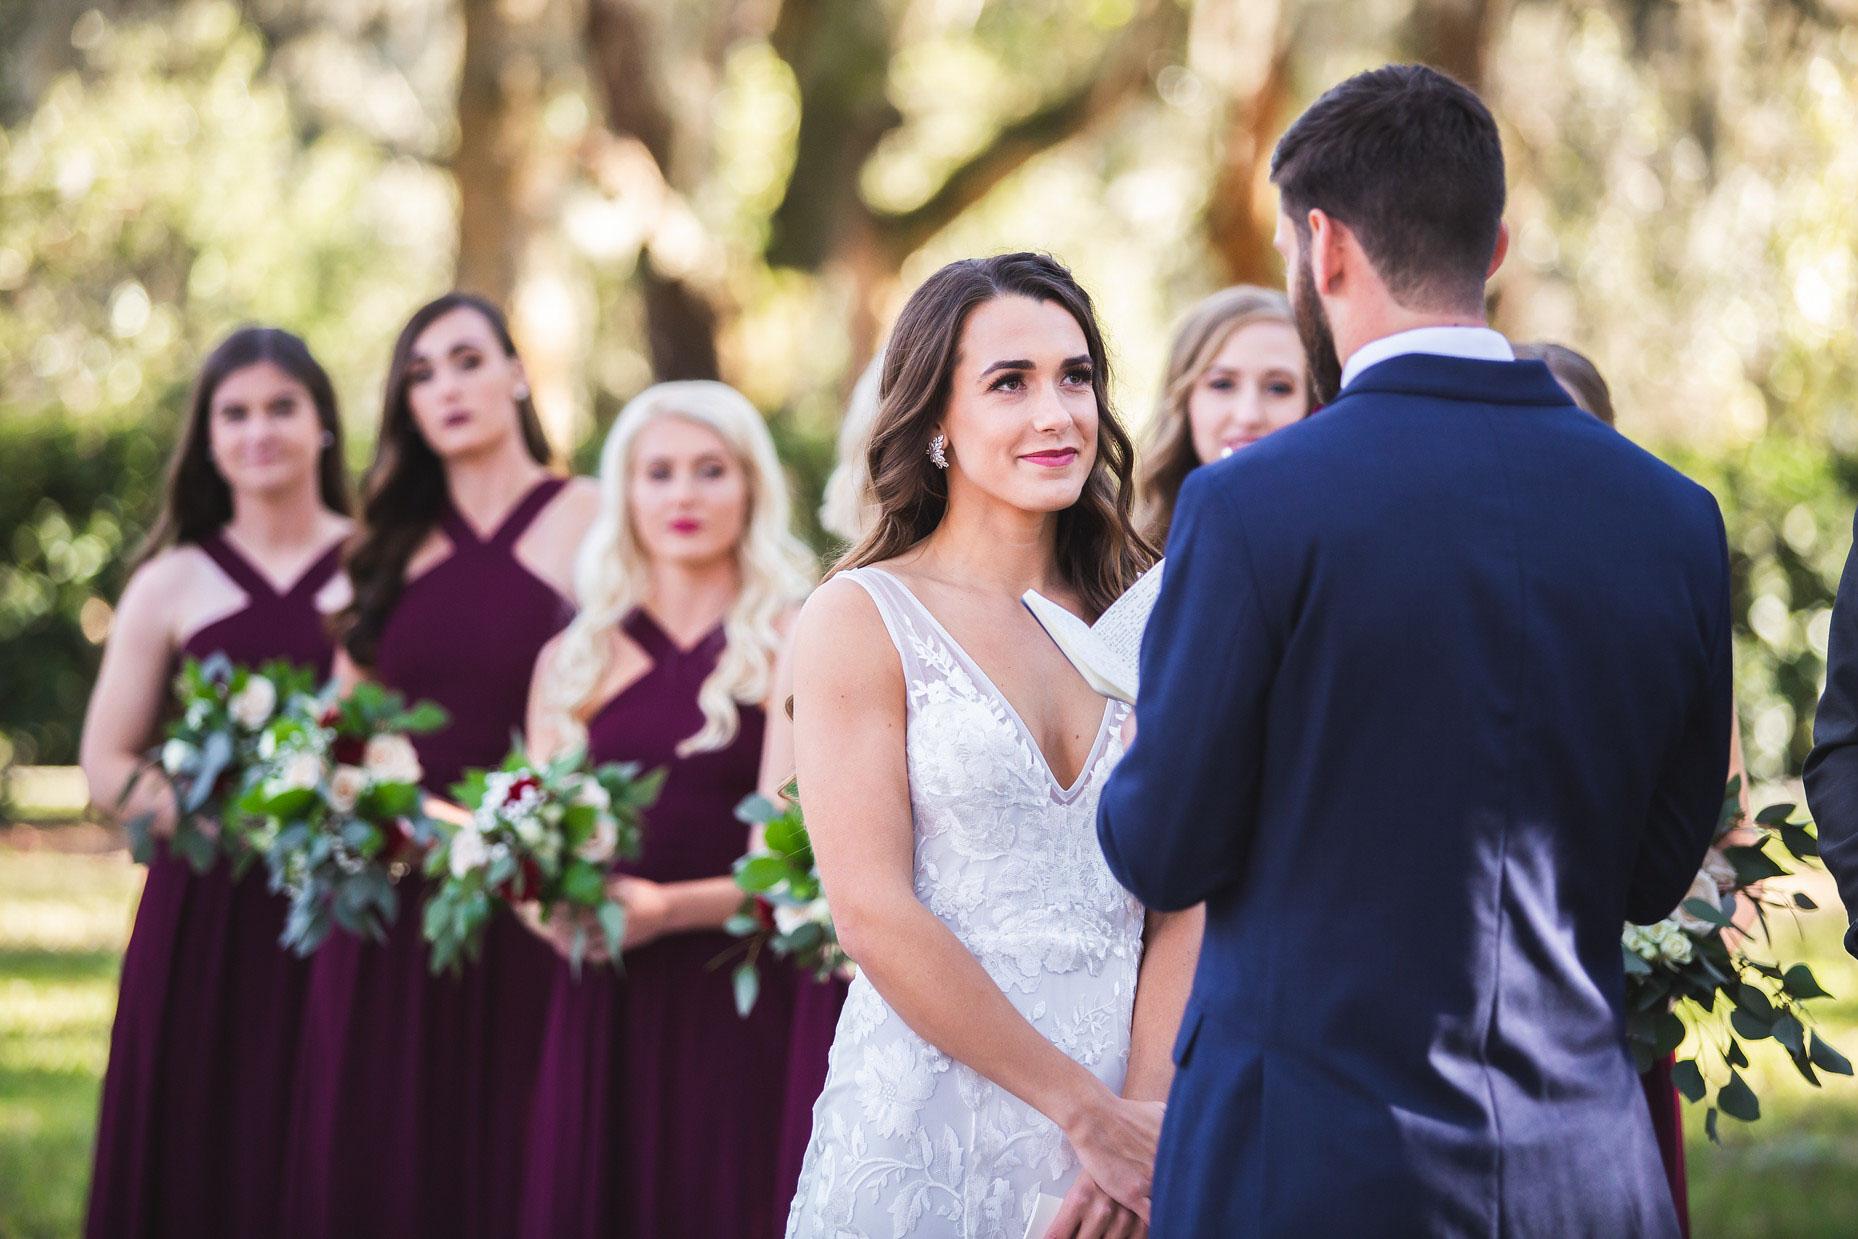 adam-szarmack-bowing-oaks-wedding-photographer-jacksonville-77.jpg